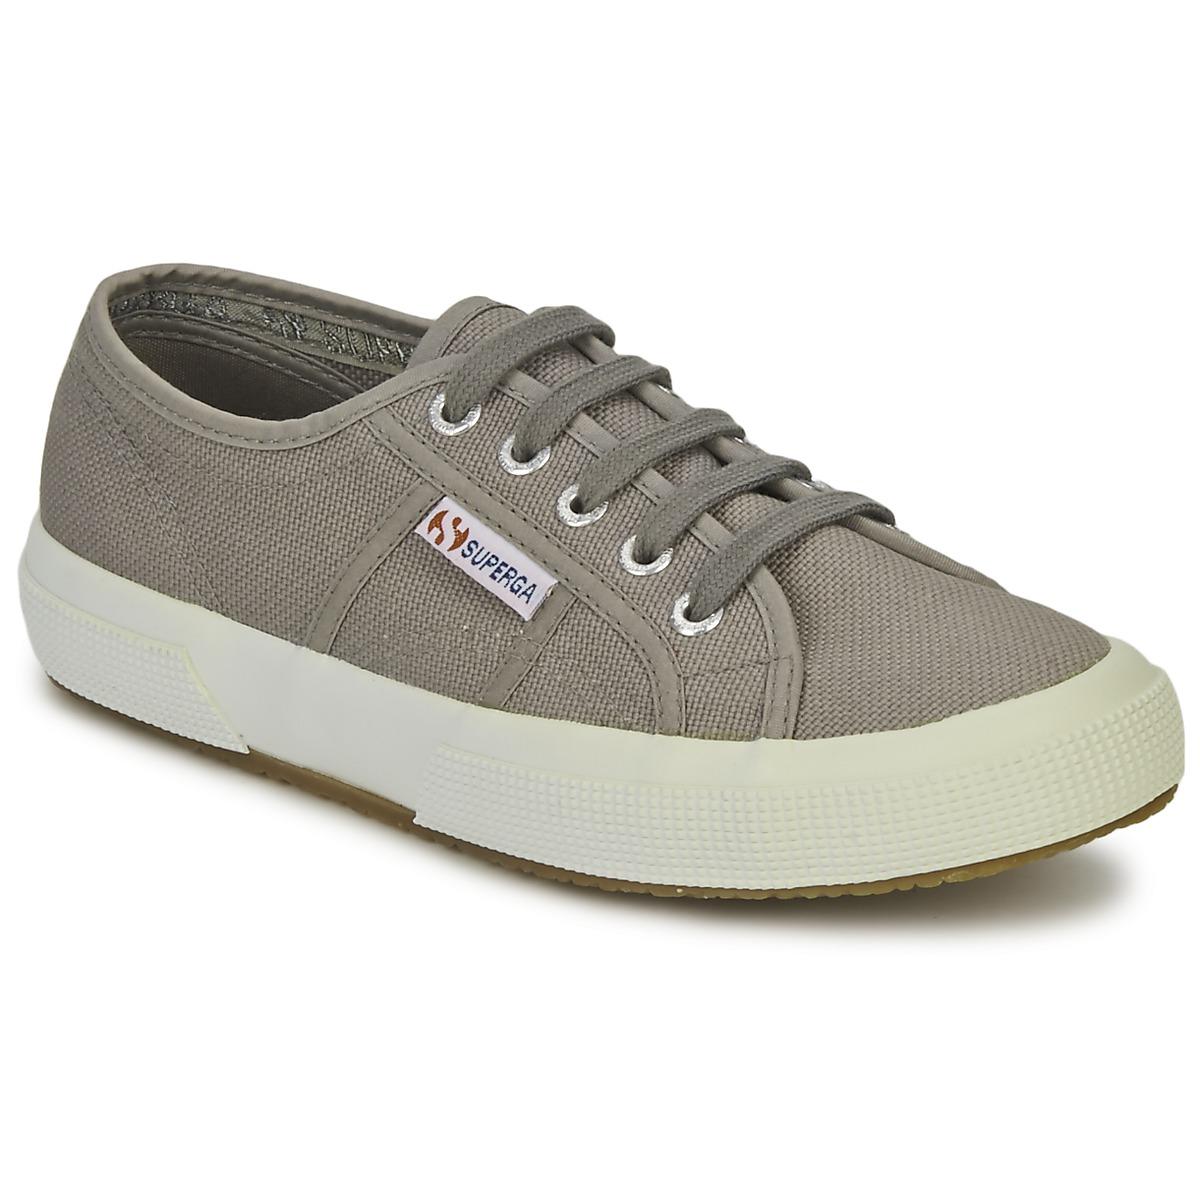 Superga 2750 CLASSIC Grau - Kostenloser Versand bei Spartoode ! - Schuhe Sneaker Low  47,99 €